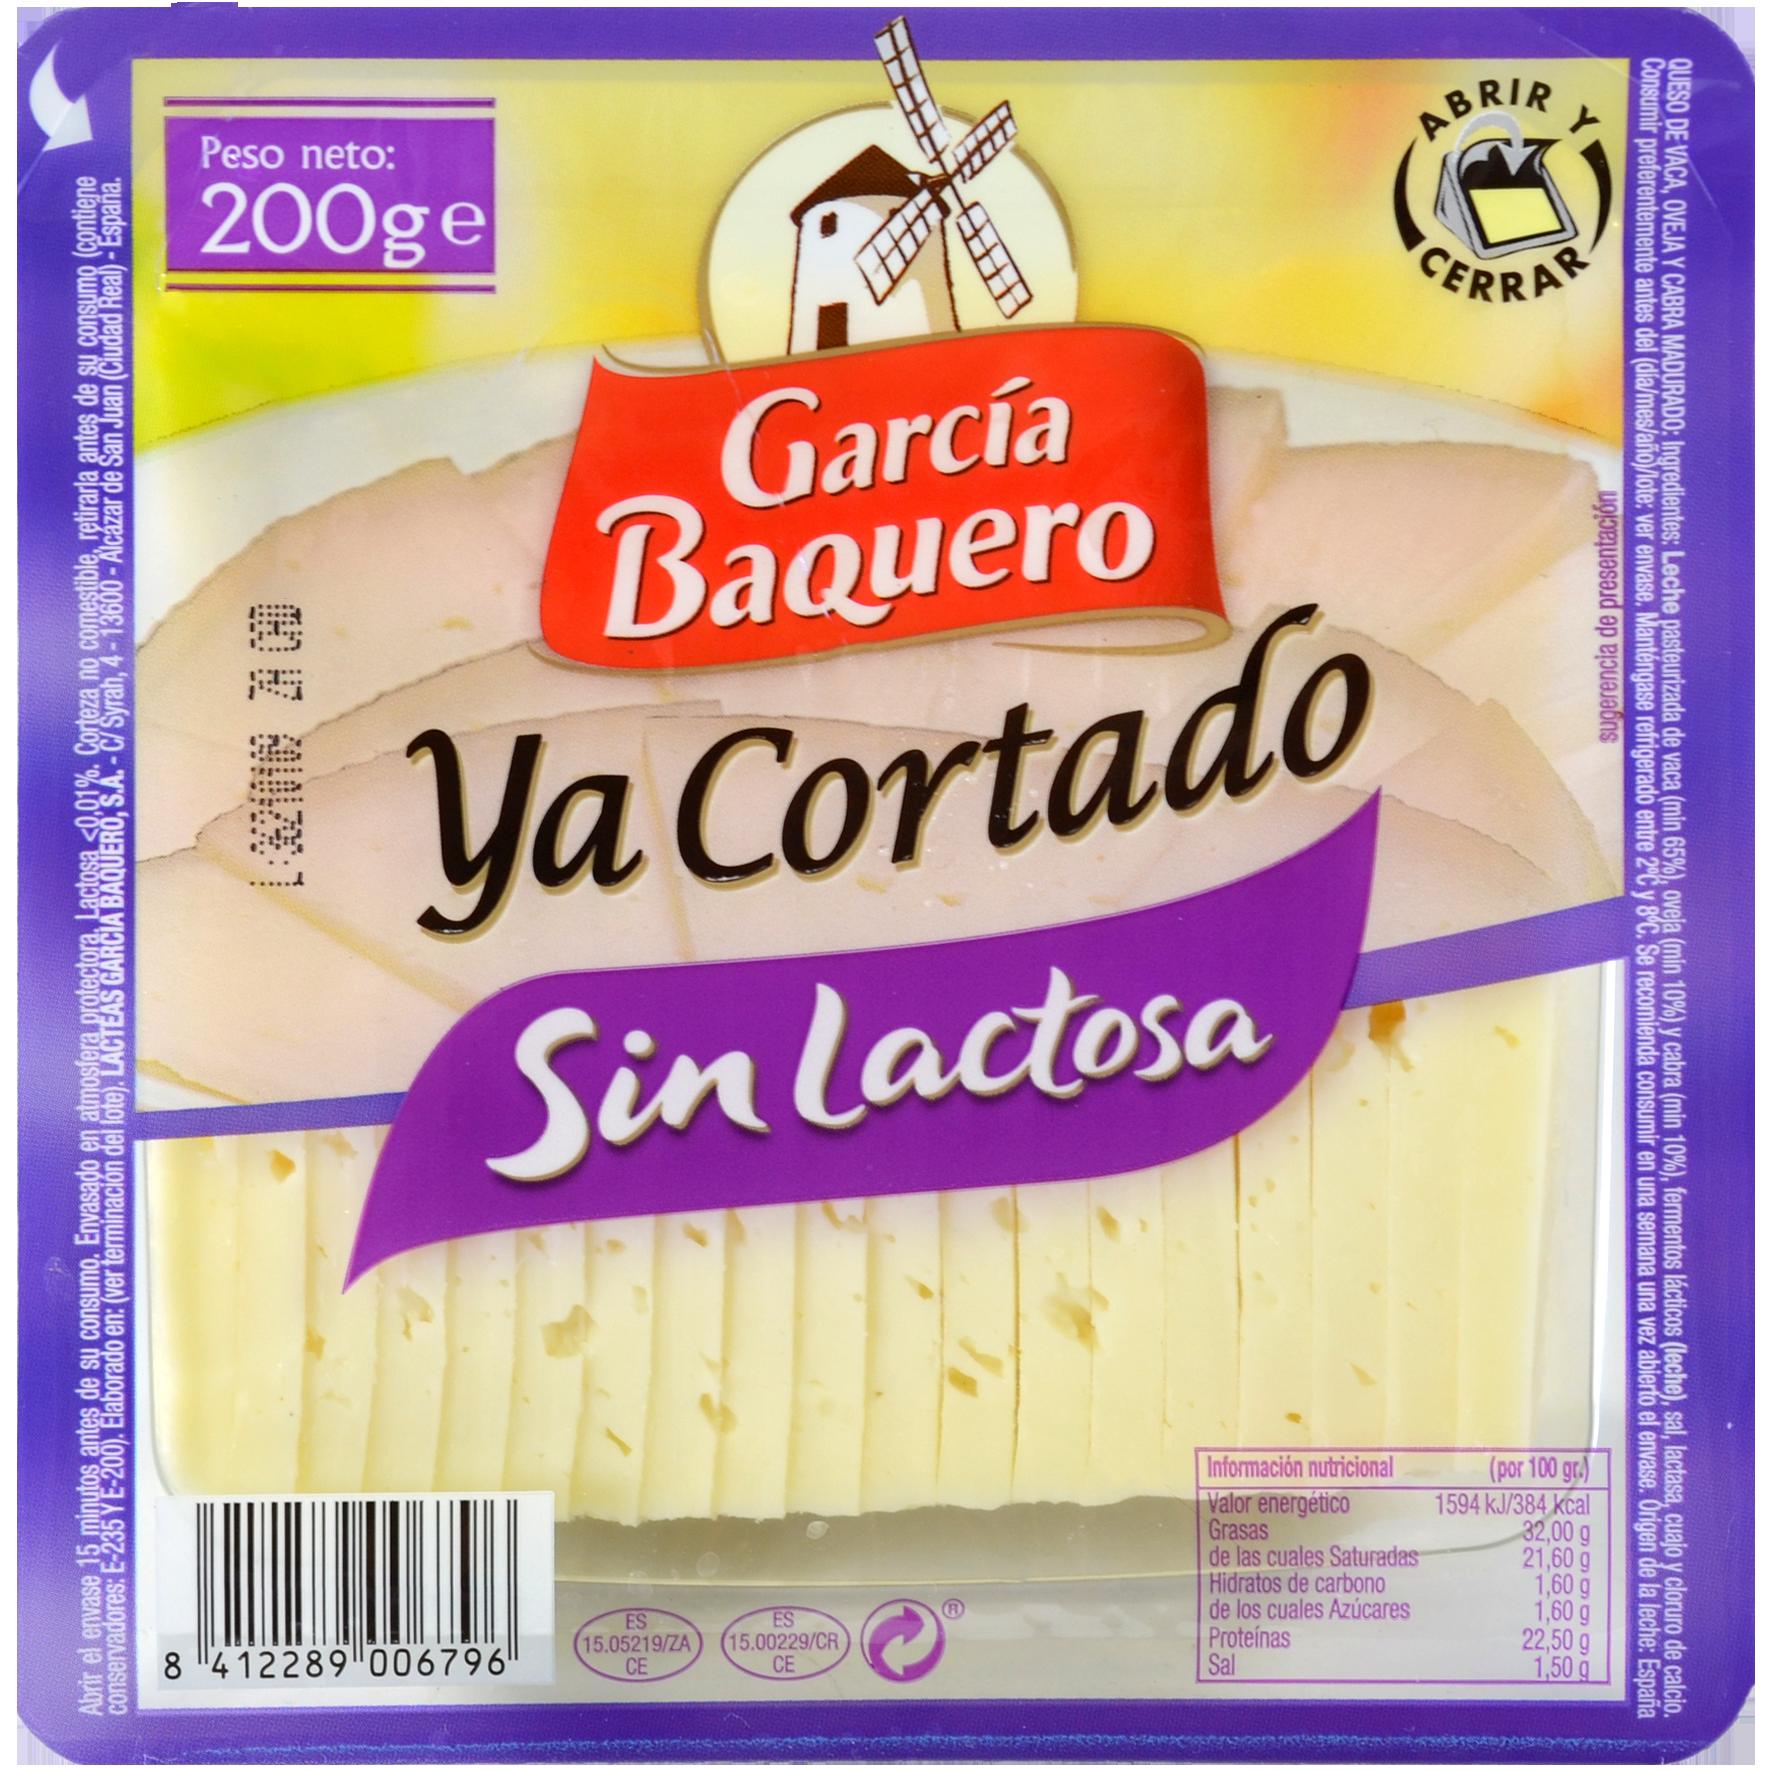 Formatge semicurat sense lactosa Garcia Baquero ja tallat